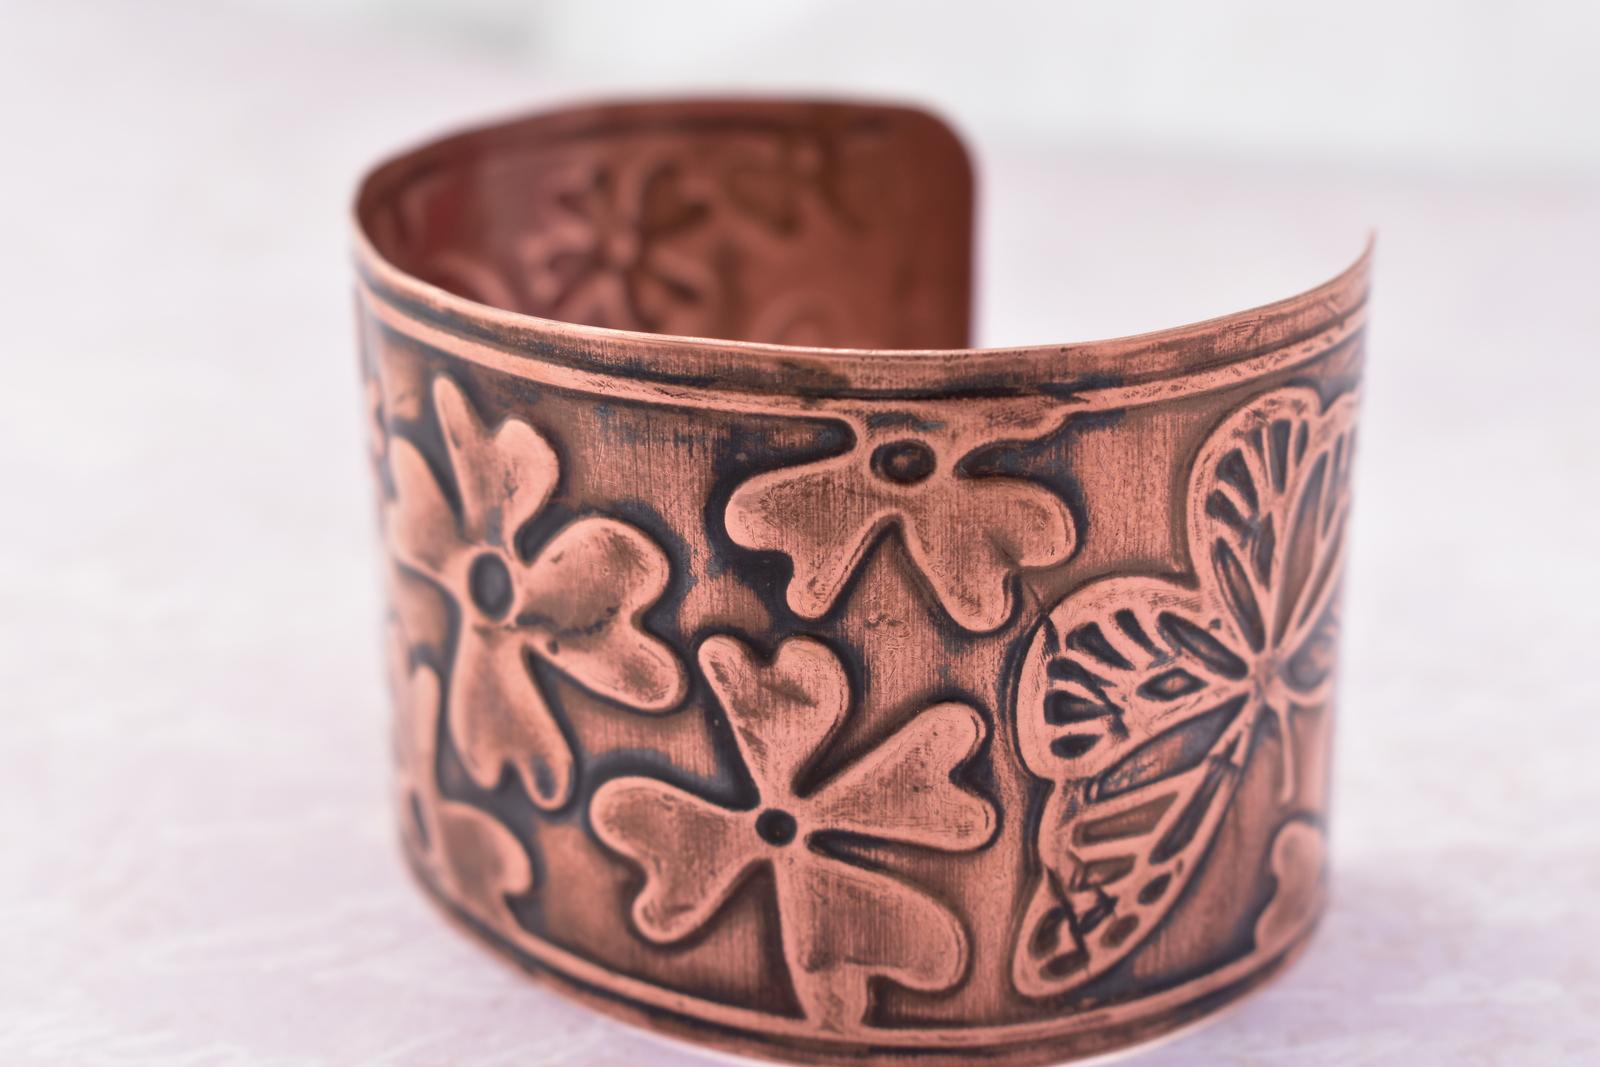 Copper embossed cuff bracelet